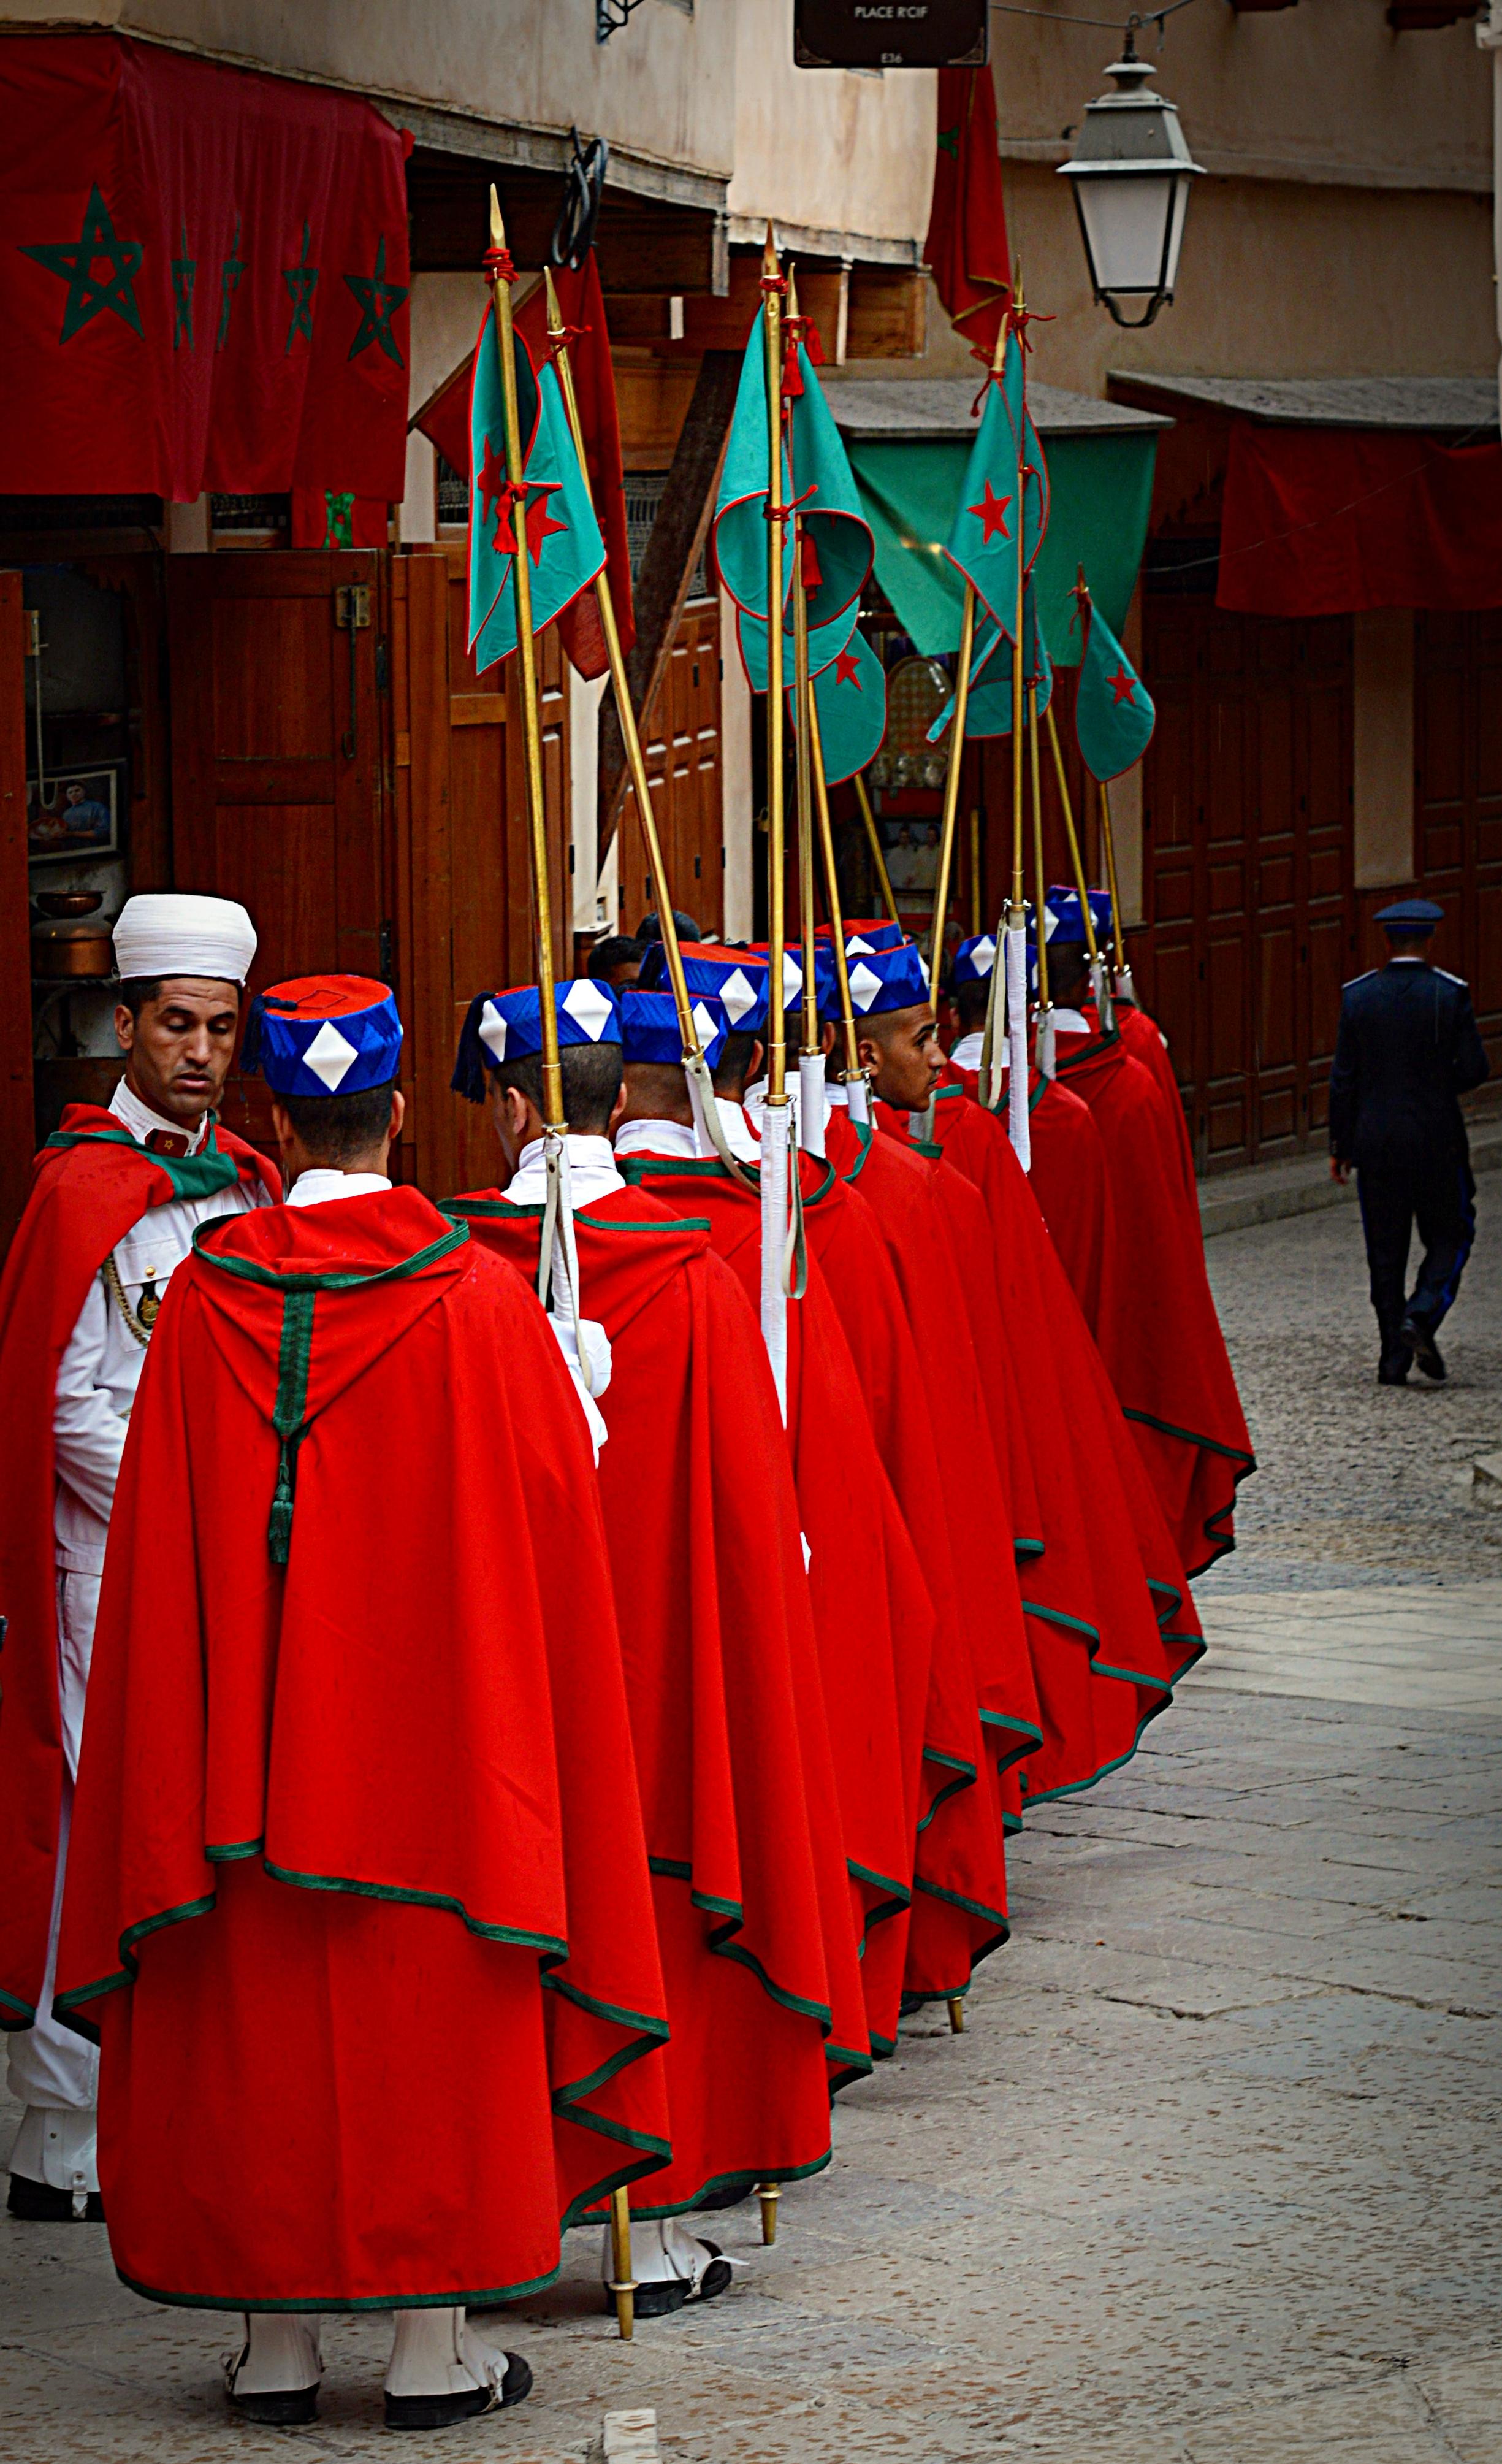 La Garde Royale Marocaine / Moroccan Royal Guard - Page 13 34842754756_d3b3e203e3_o_d